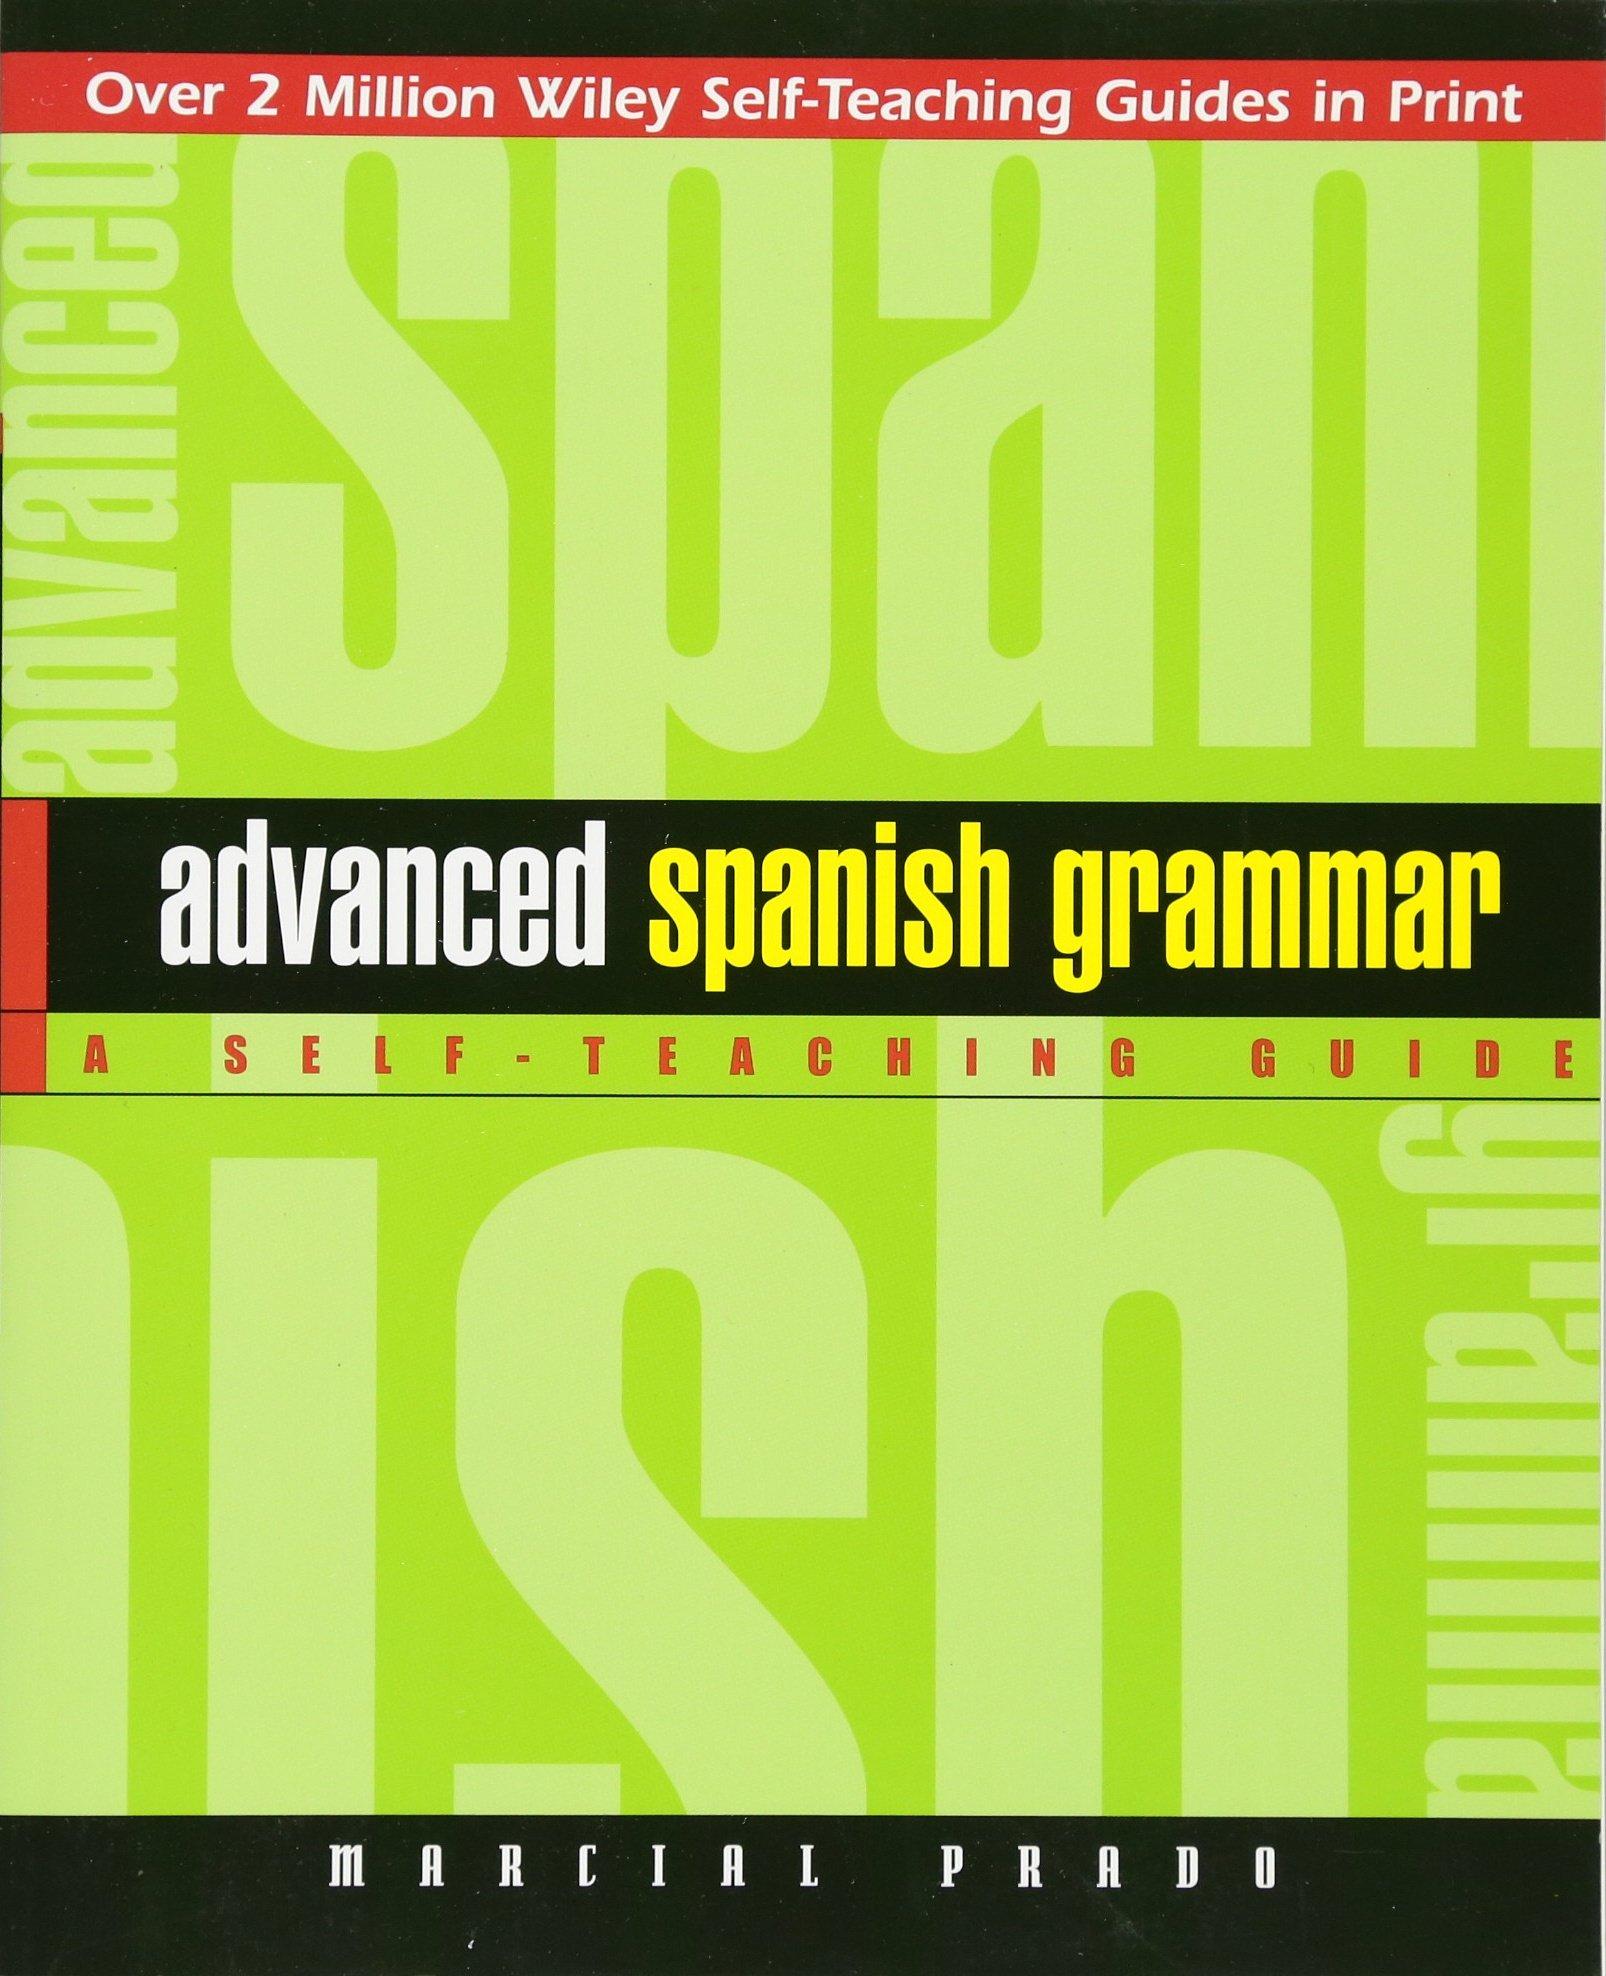 Advanced Spanish Grammar: A Self-Teaching Guide (Wiley Self-Teaching Guides):  Amazon.co.uk: Marcial Prado: 9780471134480: Books